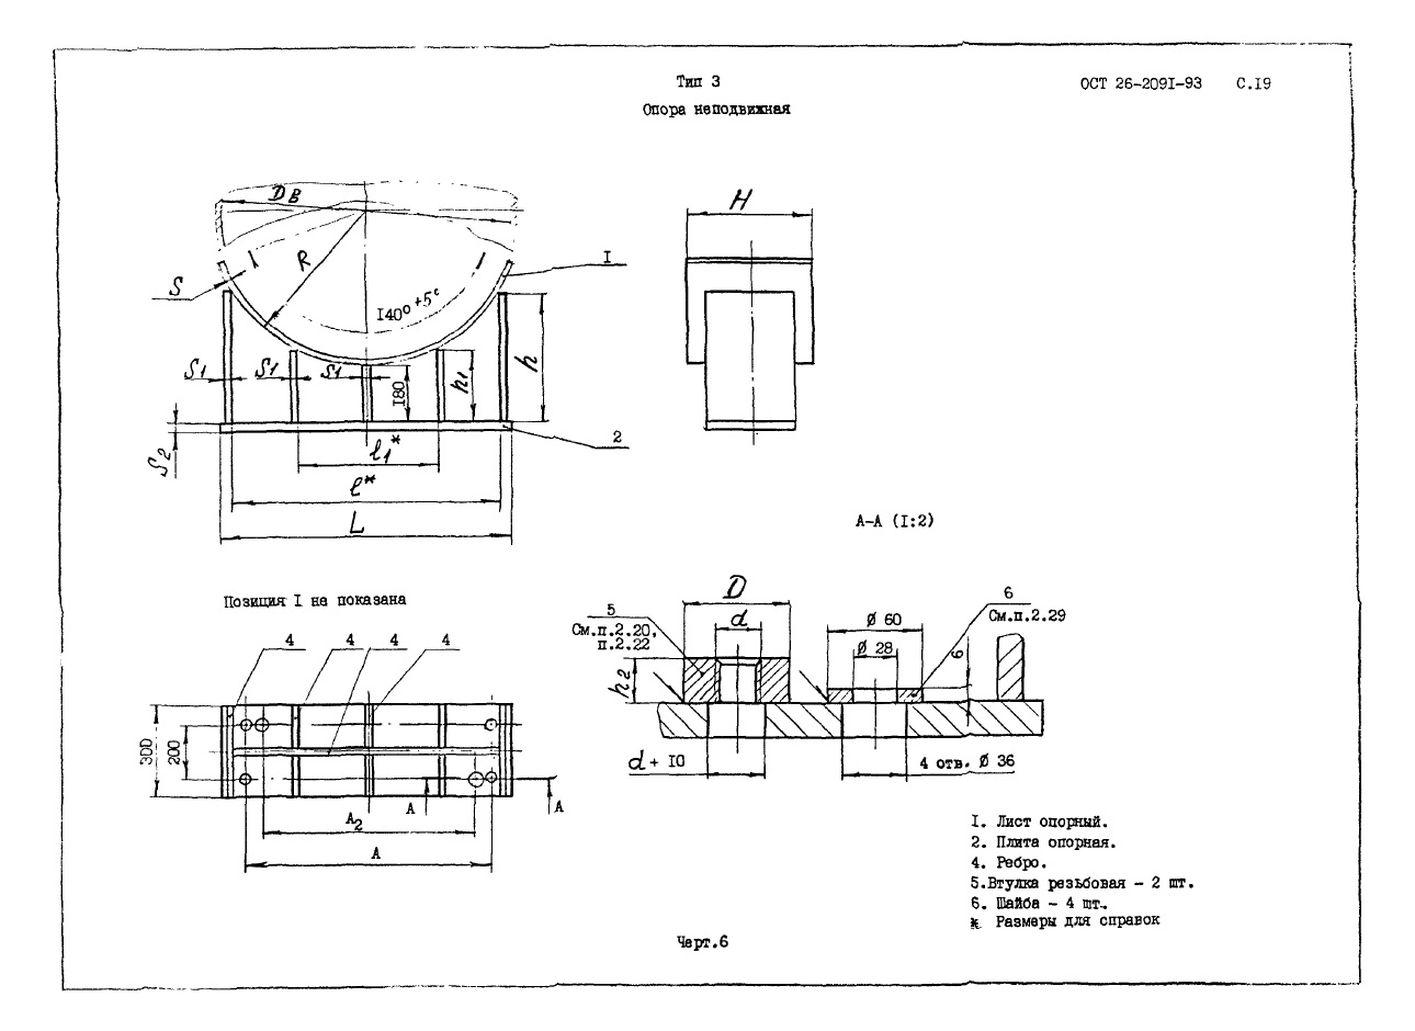 Опоры тип 3 ОСТ 26-2091-93 стр.2